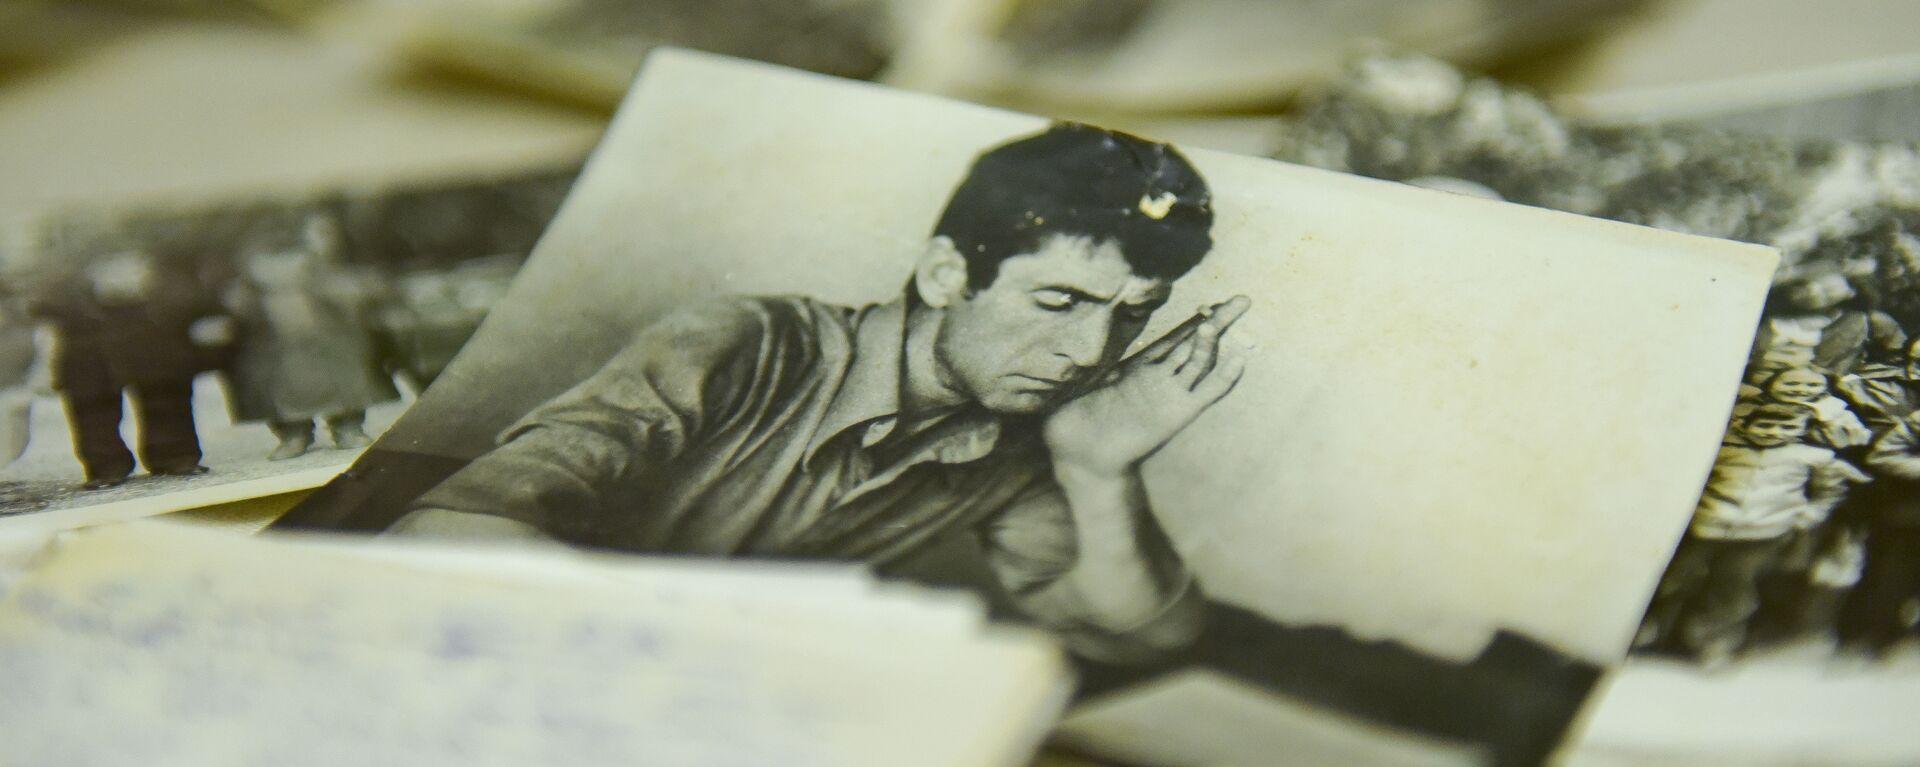 Фотографии из архива семьи Аджба. - Sputnik Абхазия, 1920, 11.03.2021